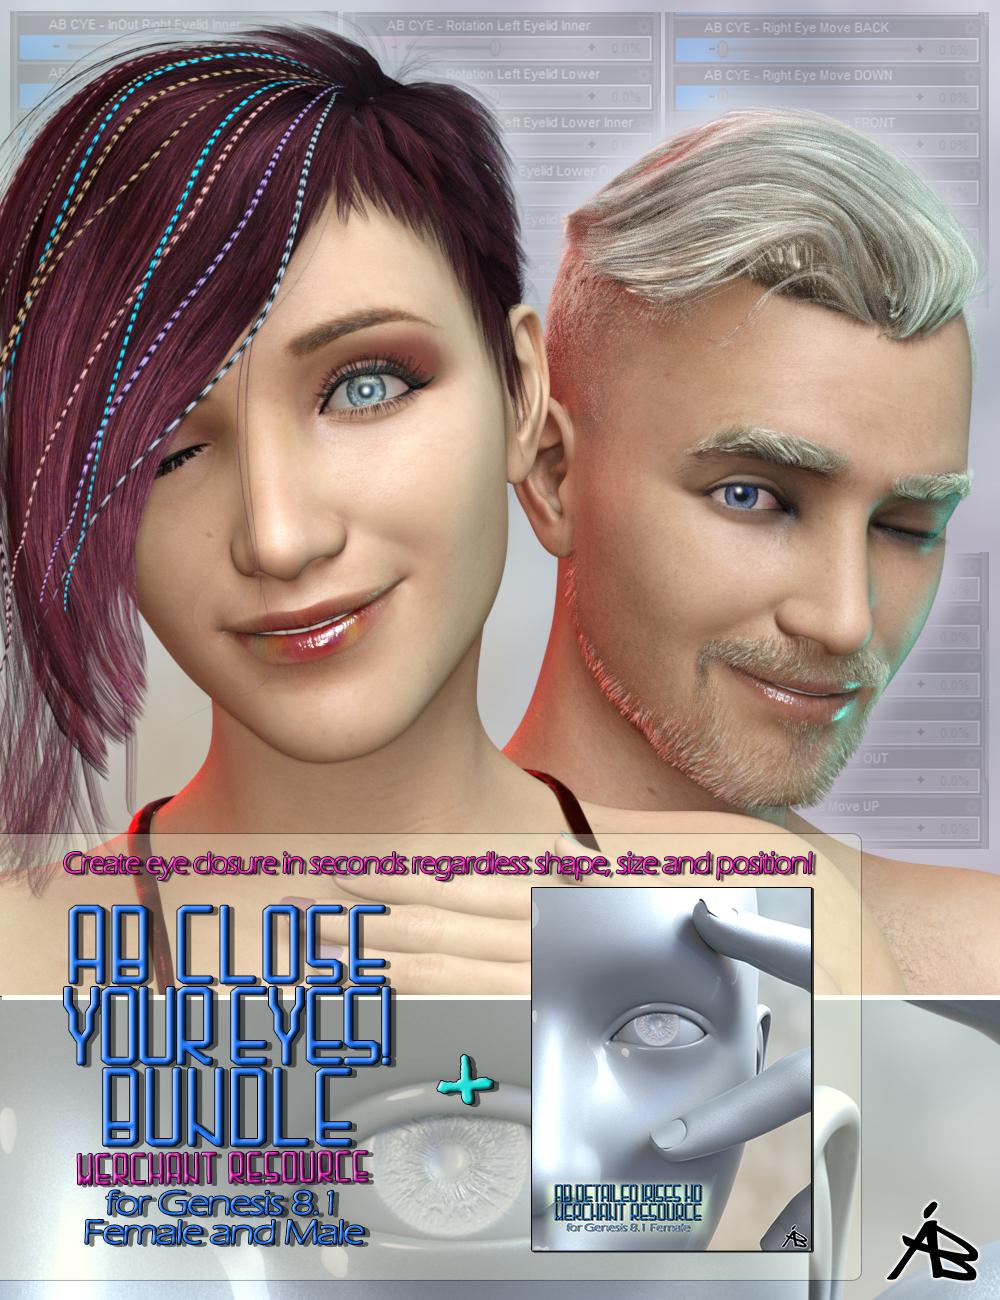 AB Close Your Eyes! Bundle (MR) by: AuraBianca, 3D Models by Daz 3D